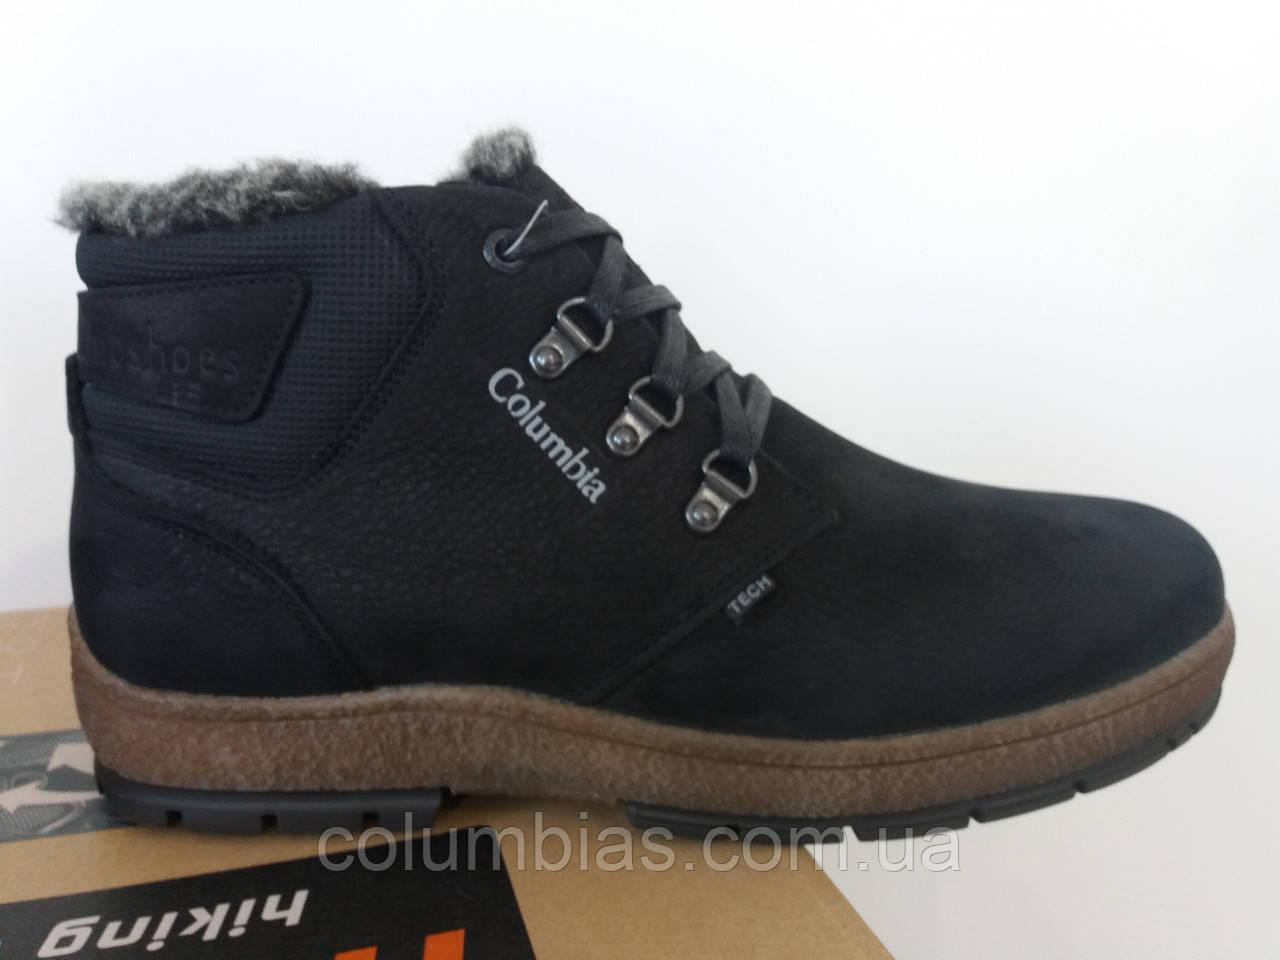 Ботинки Columbiaа кожаные